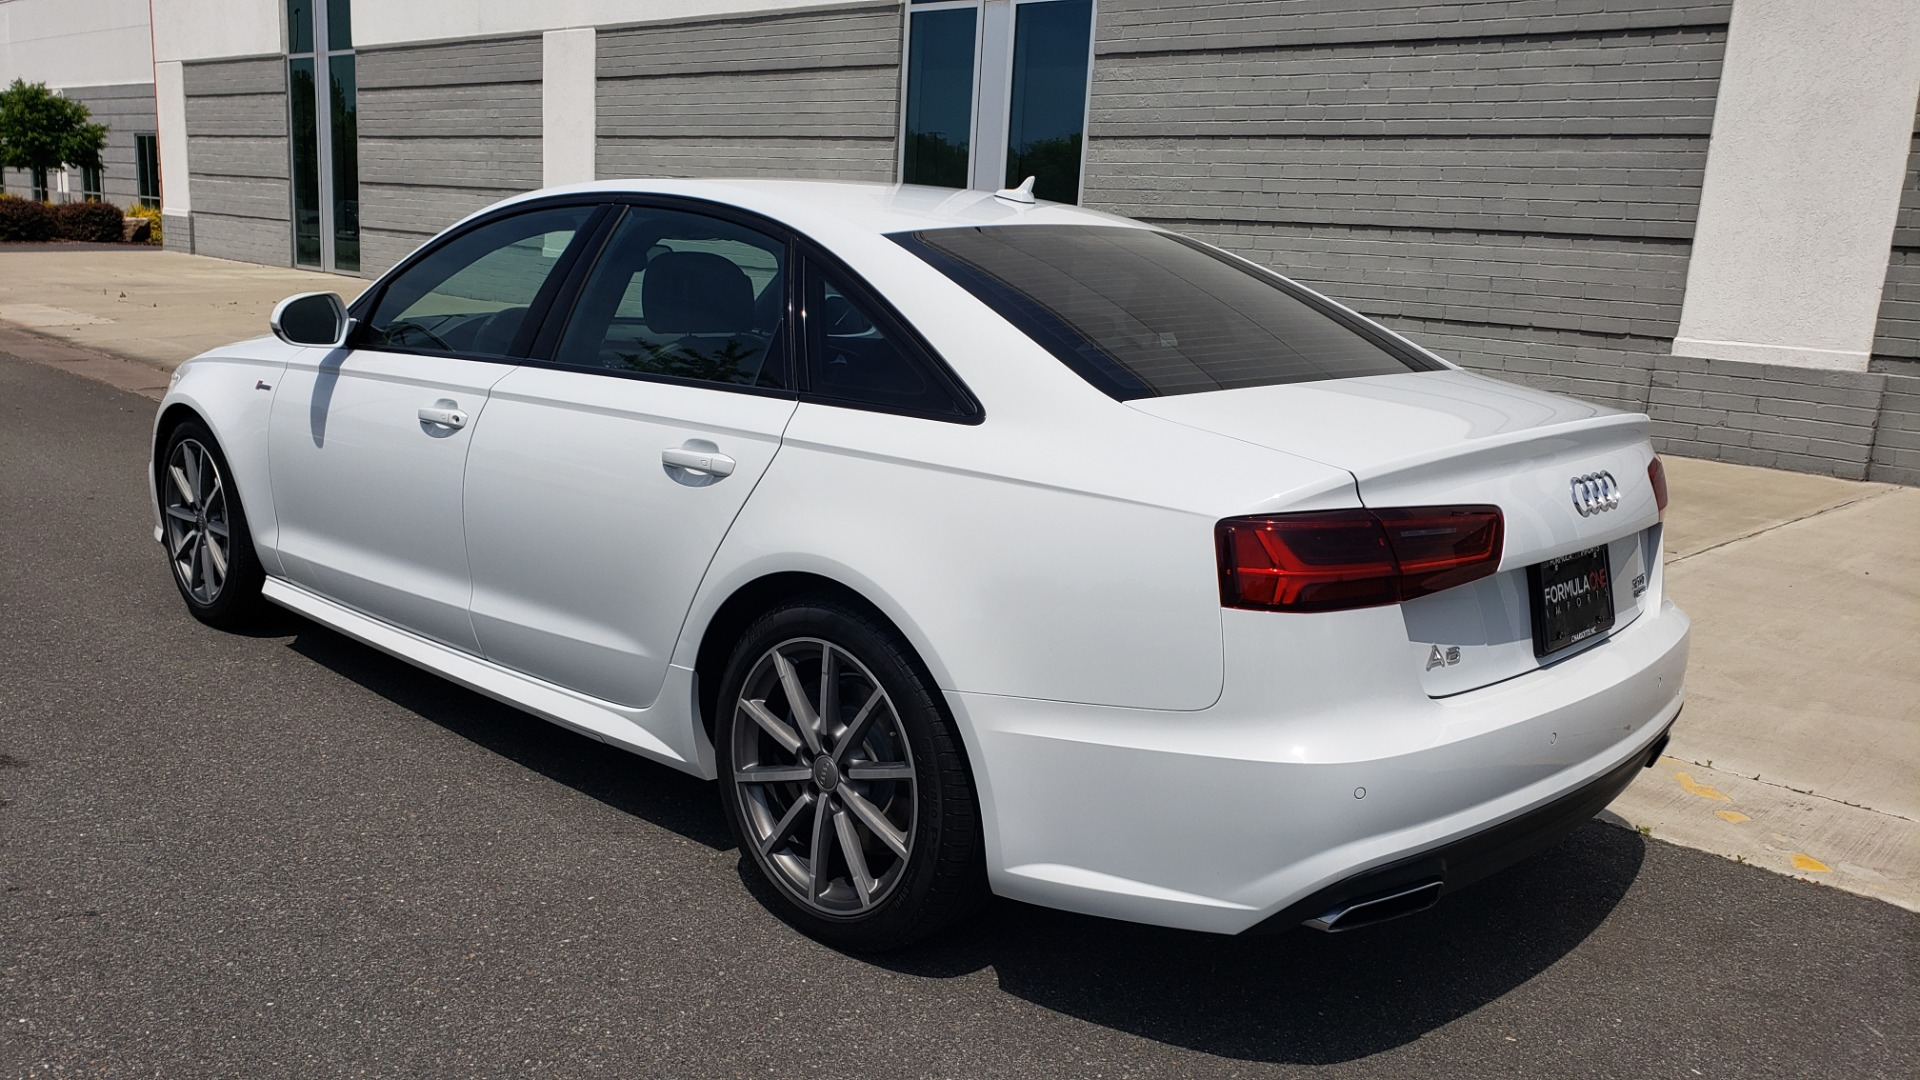 Used 2017 Audi A6 PRESTIGE SEDAN 3.0T / NAV / SUNROOF / BLACK OPTIC / CLD WTHR / REARVIEW for sale $30,797 at Formula Imports in Charlotte NC 28227 6